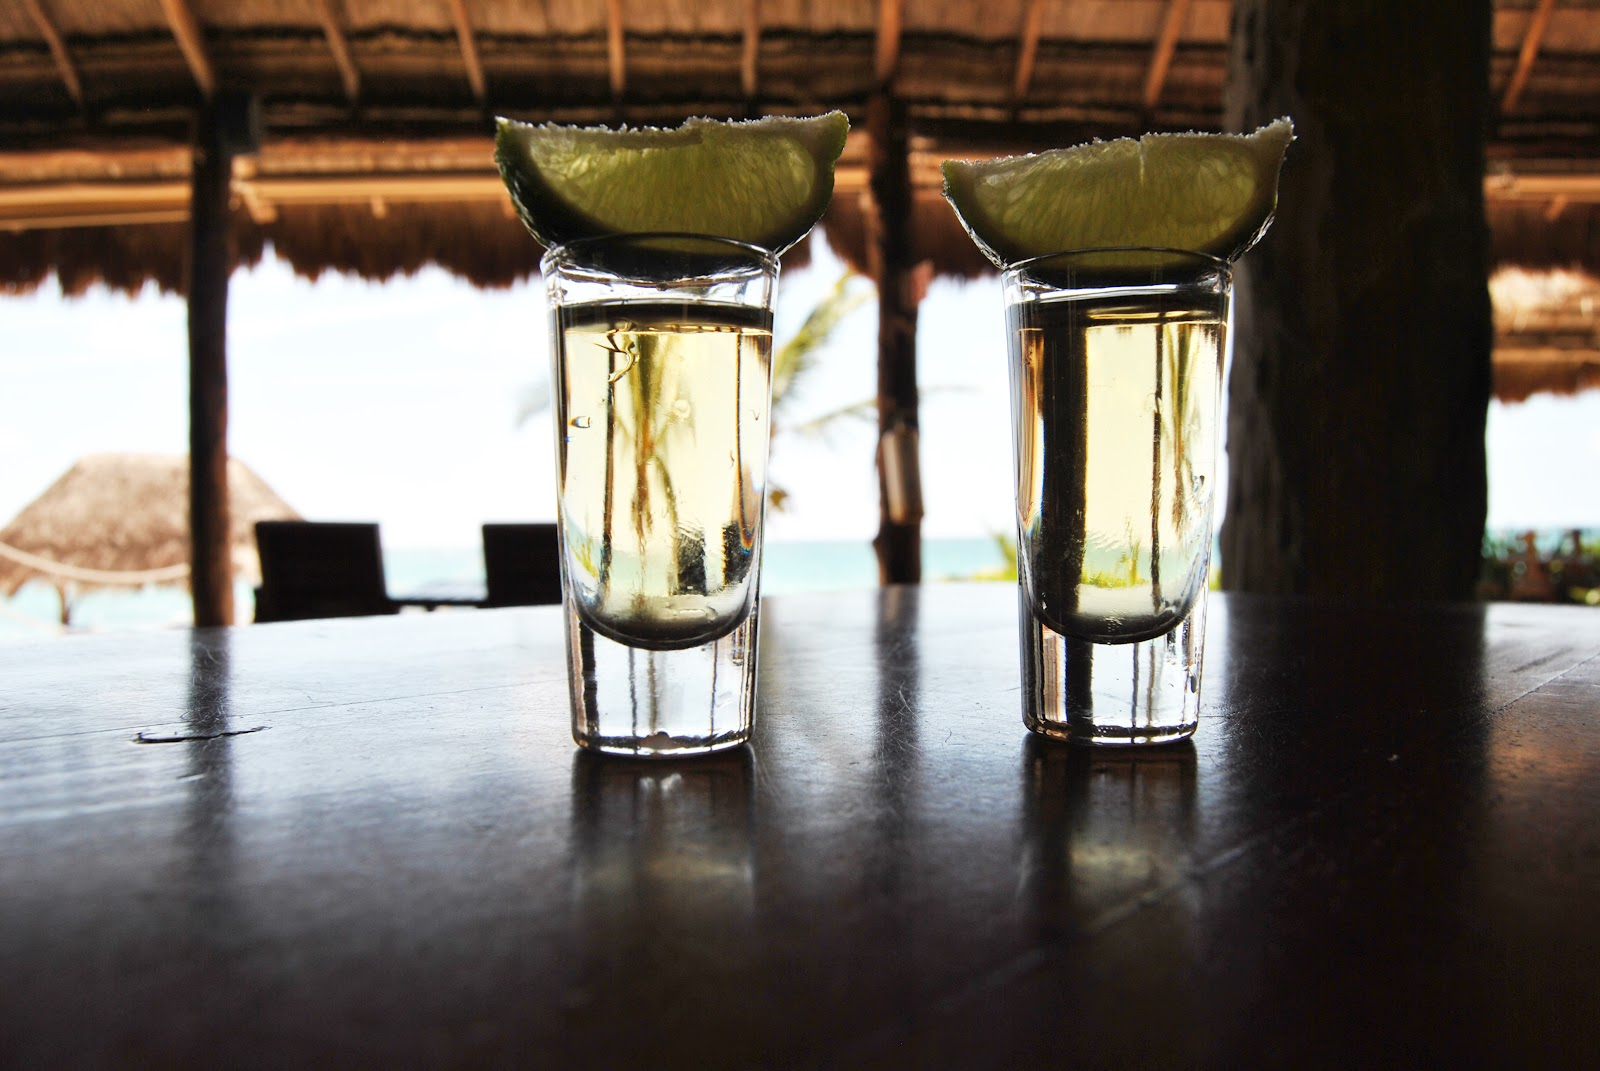 NERY HDEZ, Riviera maya, mexico, swimwear, paradise, tequila